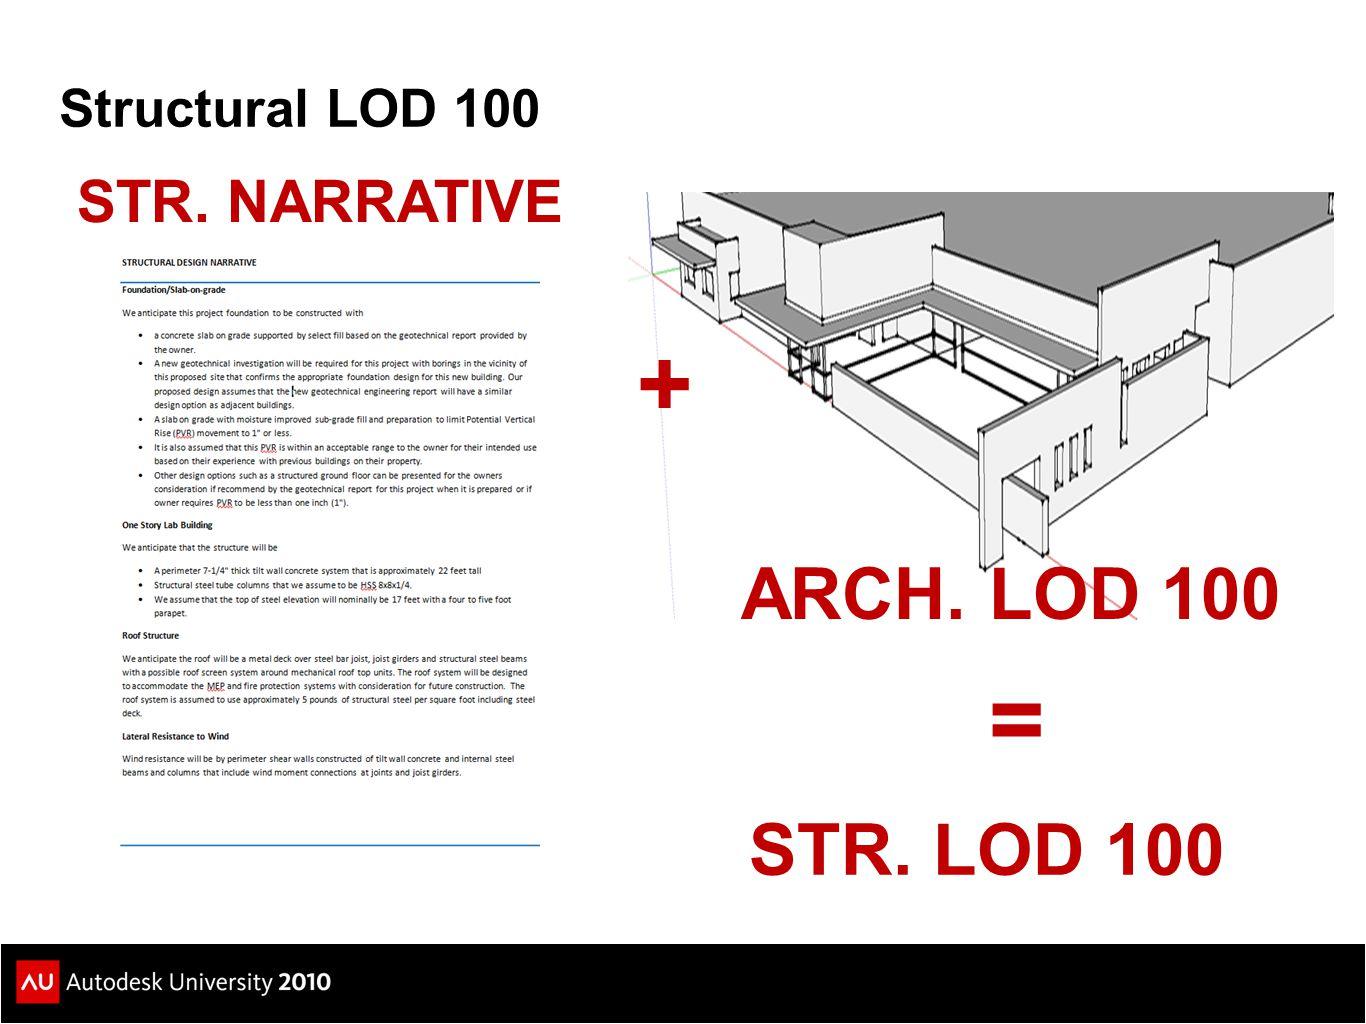 Structural LOD 100 STR. NARRATIVE + ARCH. LOD 100 = STR. LOD 100